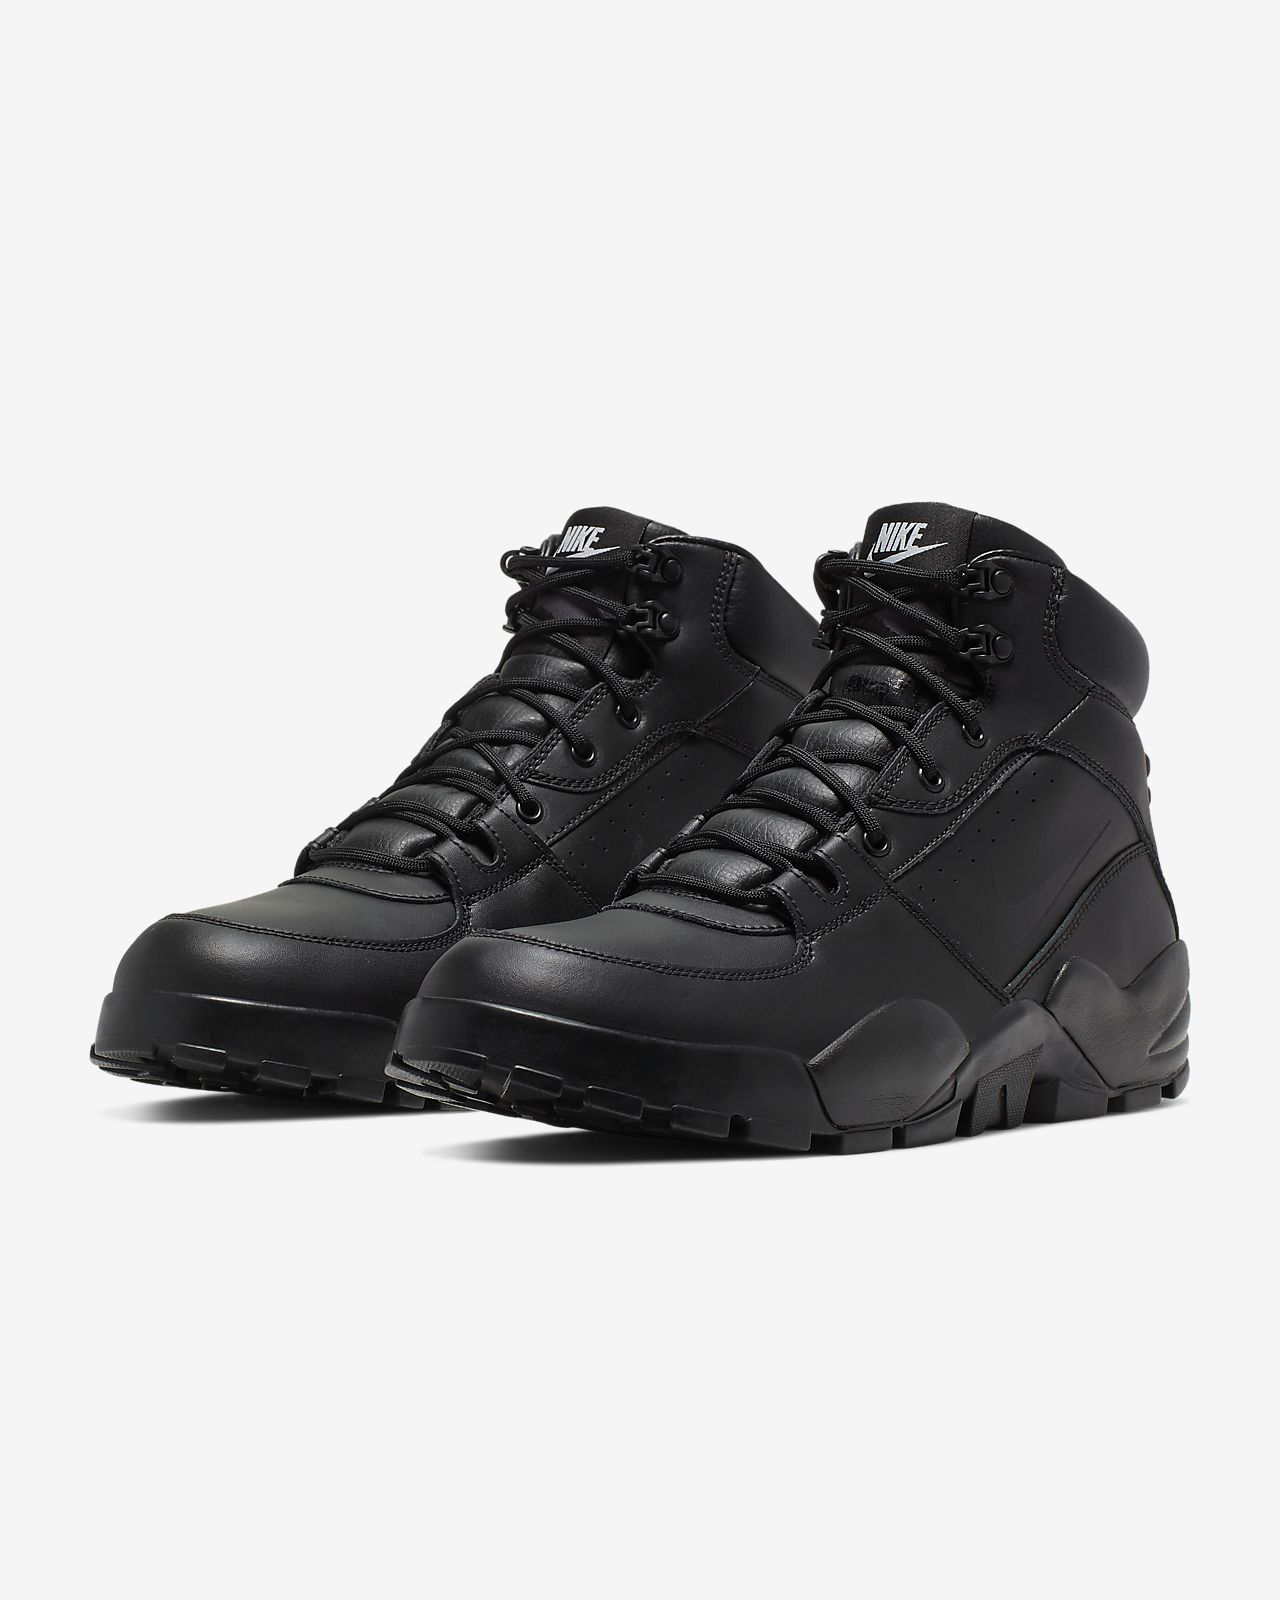 Athletic Shoes Nike Lunar Force 1 Duckboot '18 Men's 10.5